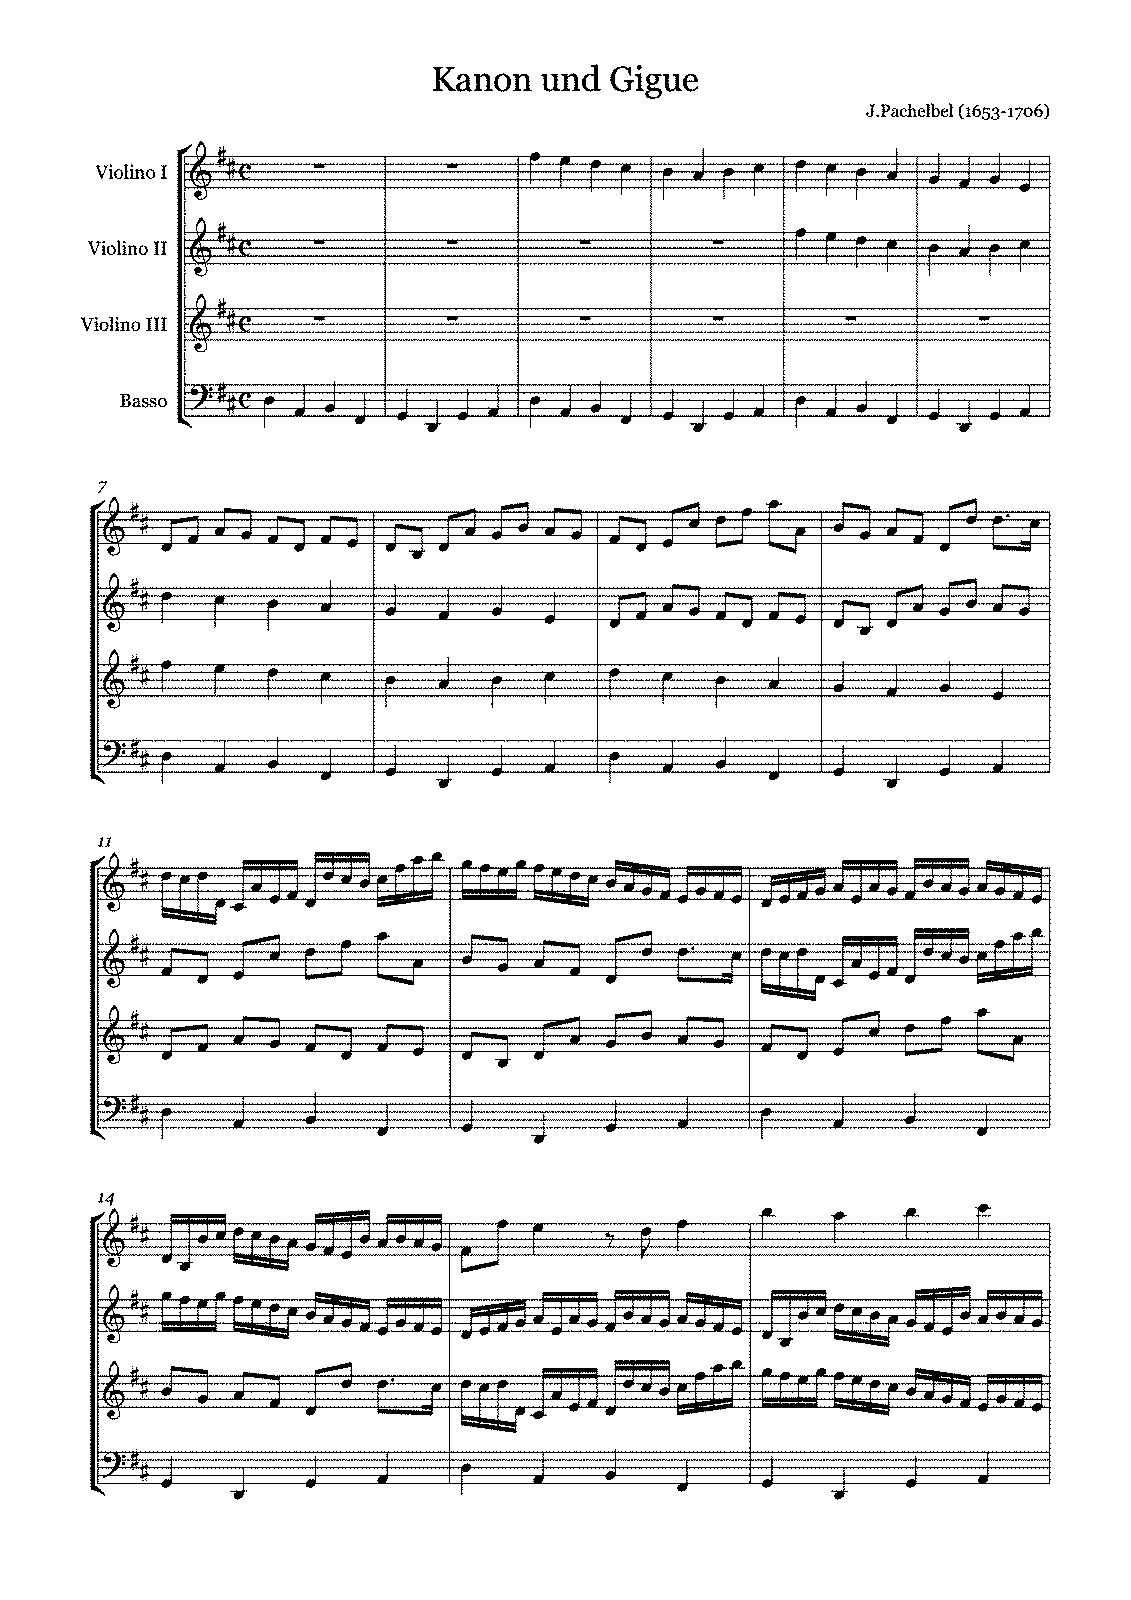 Canon and gigue in d major p37 pachelbel johann imslp sheet music hexwebz Gallery